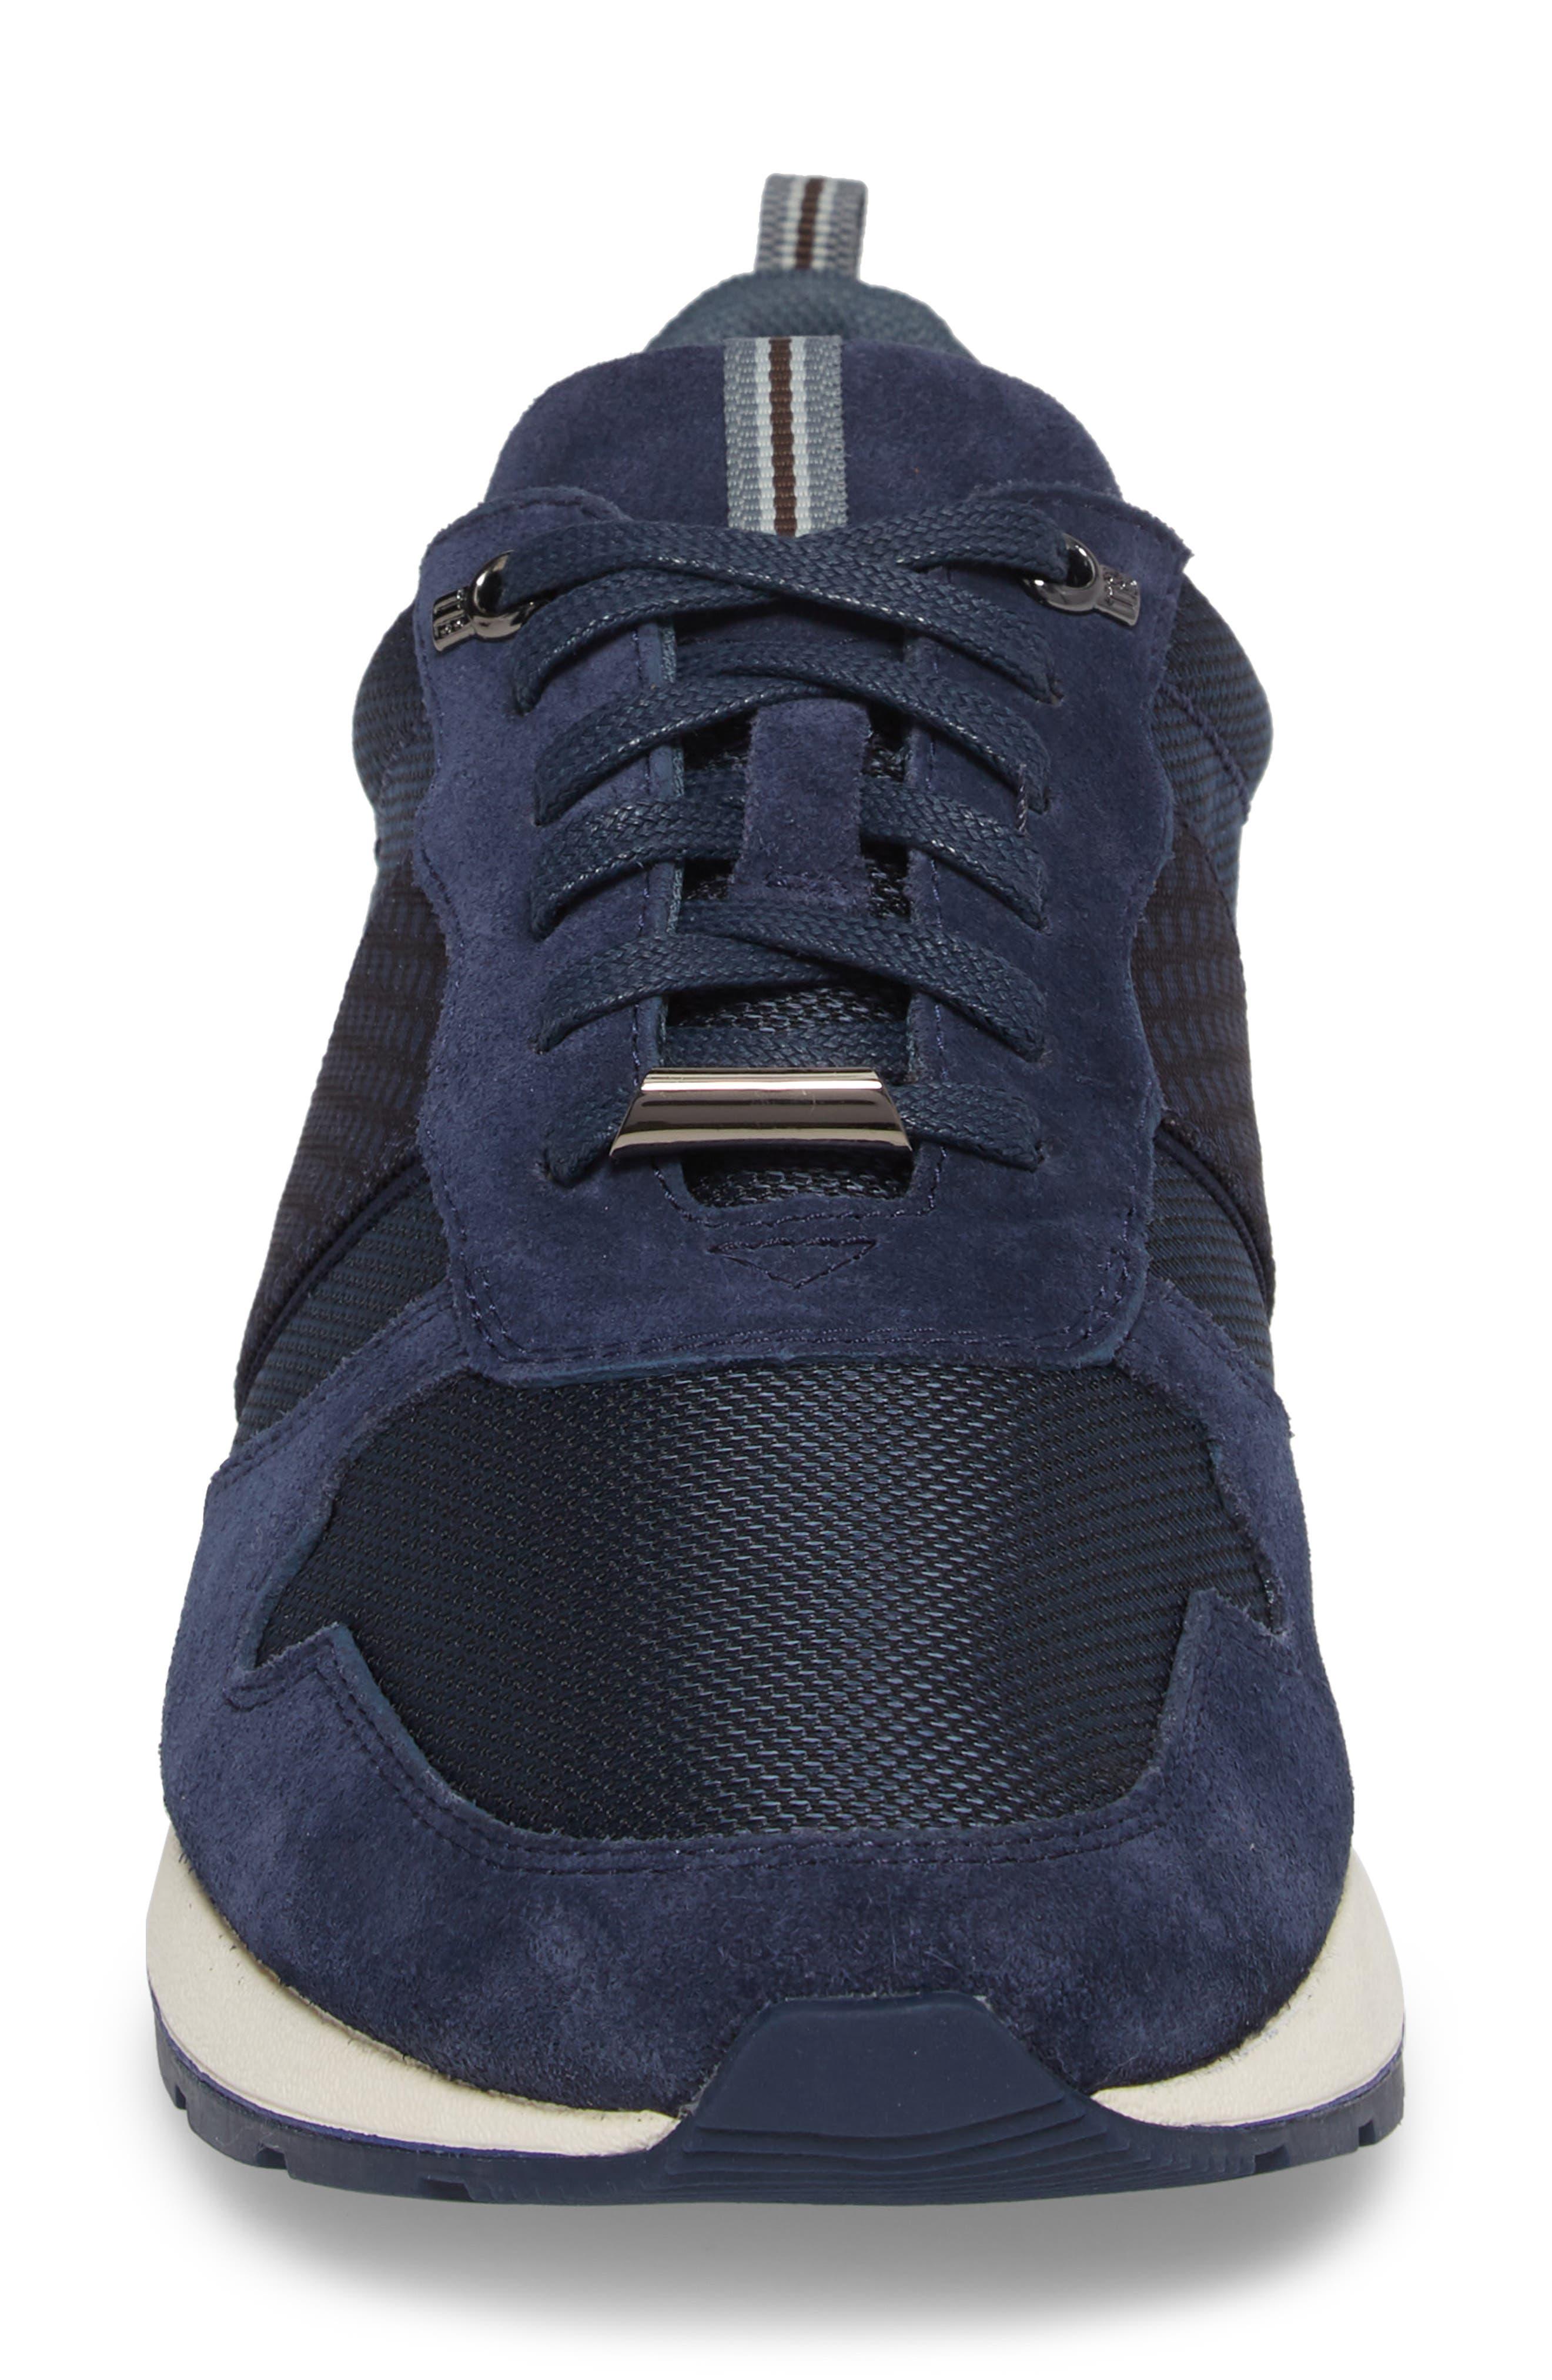 Hebey Lace-Up Sneaker,                             Alternate thumbnail 4, color,                             DARK BLUE TEXTILE